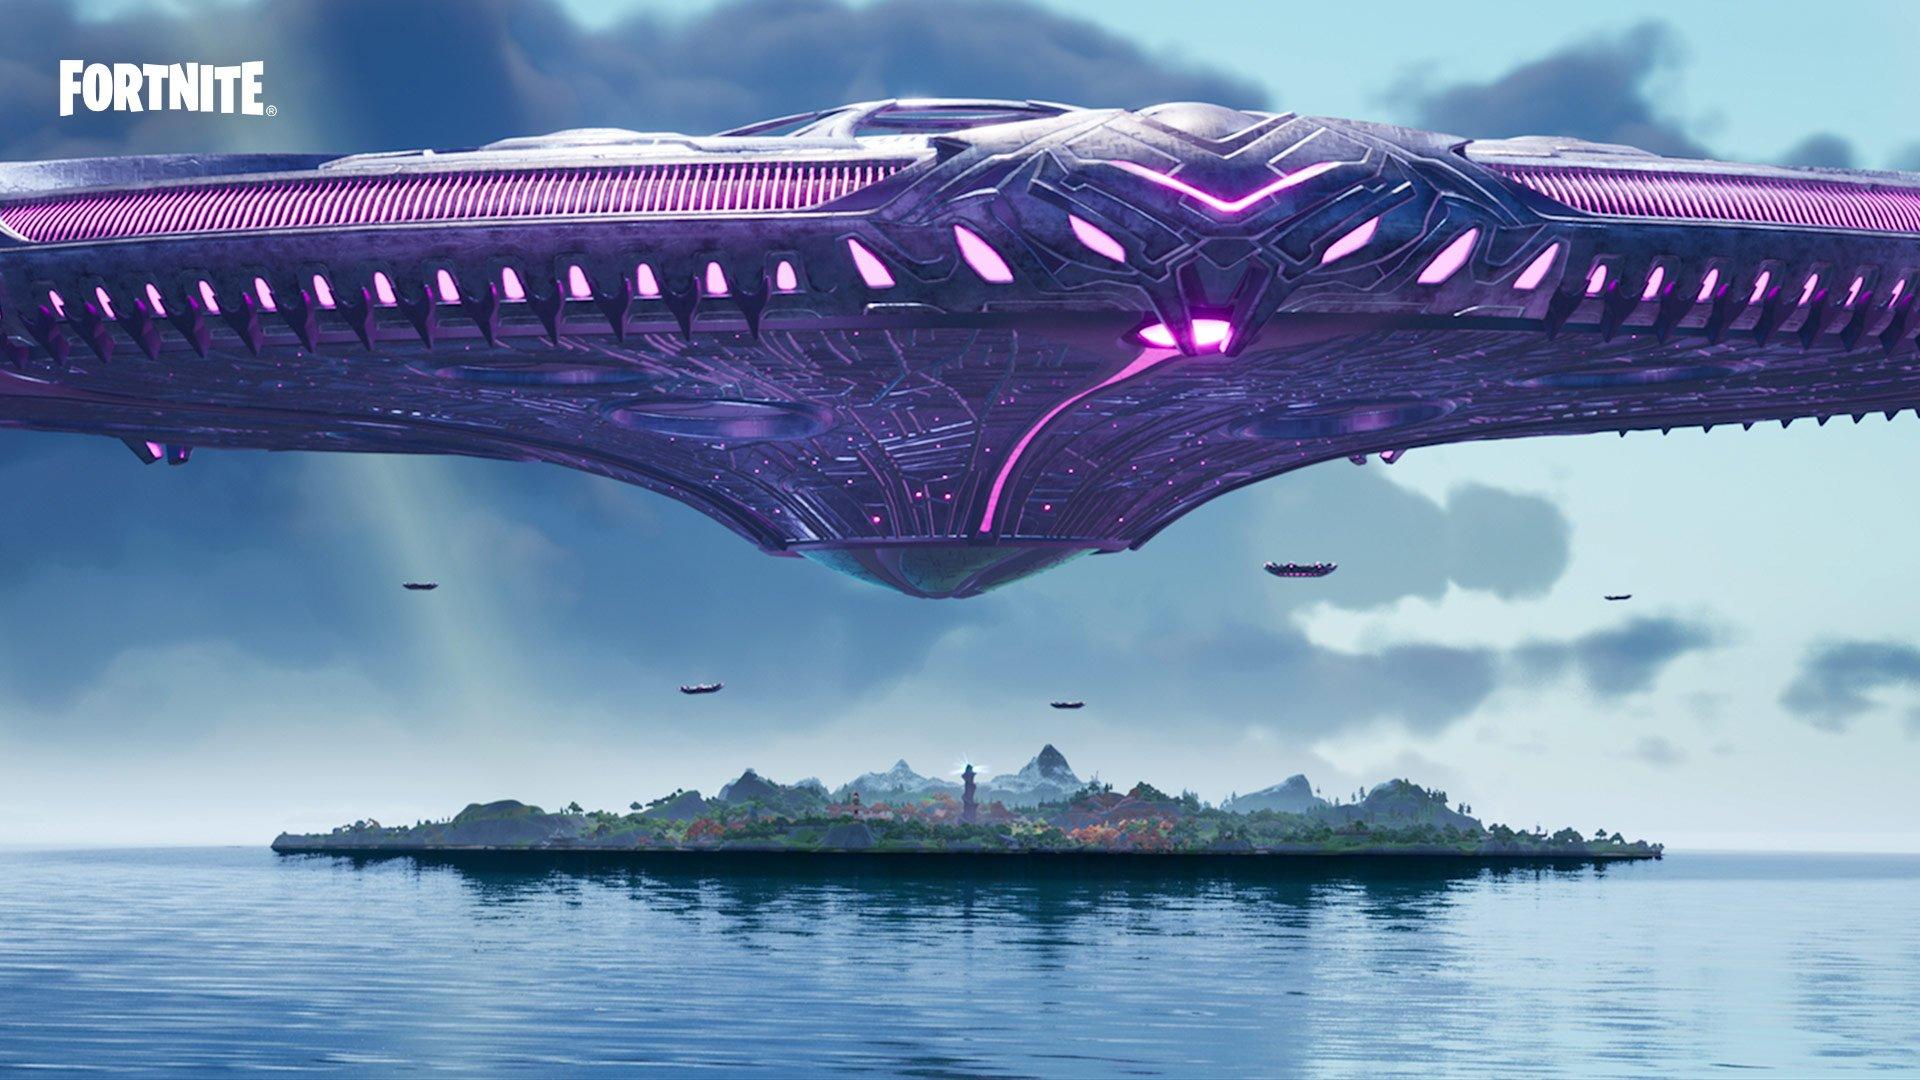 Fortnite Epic Games Invasion